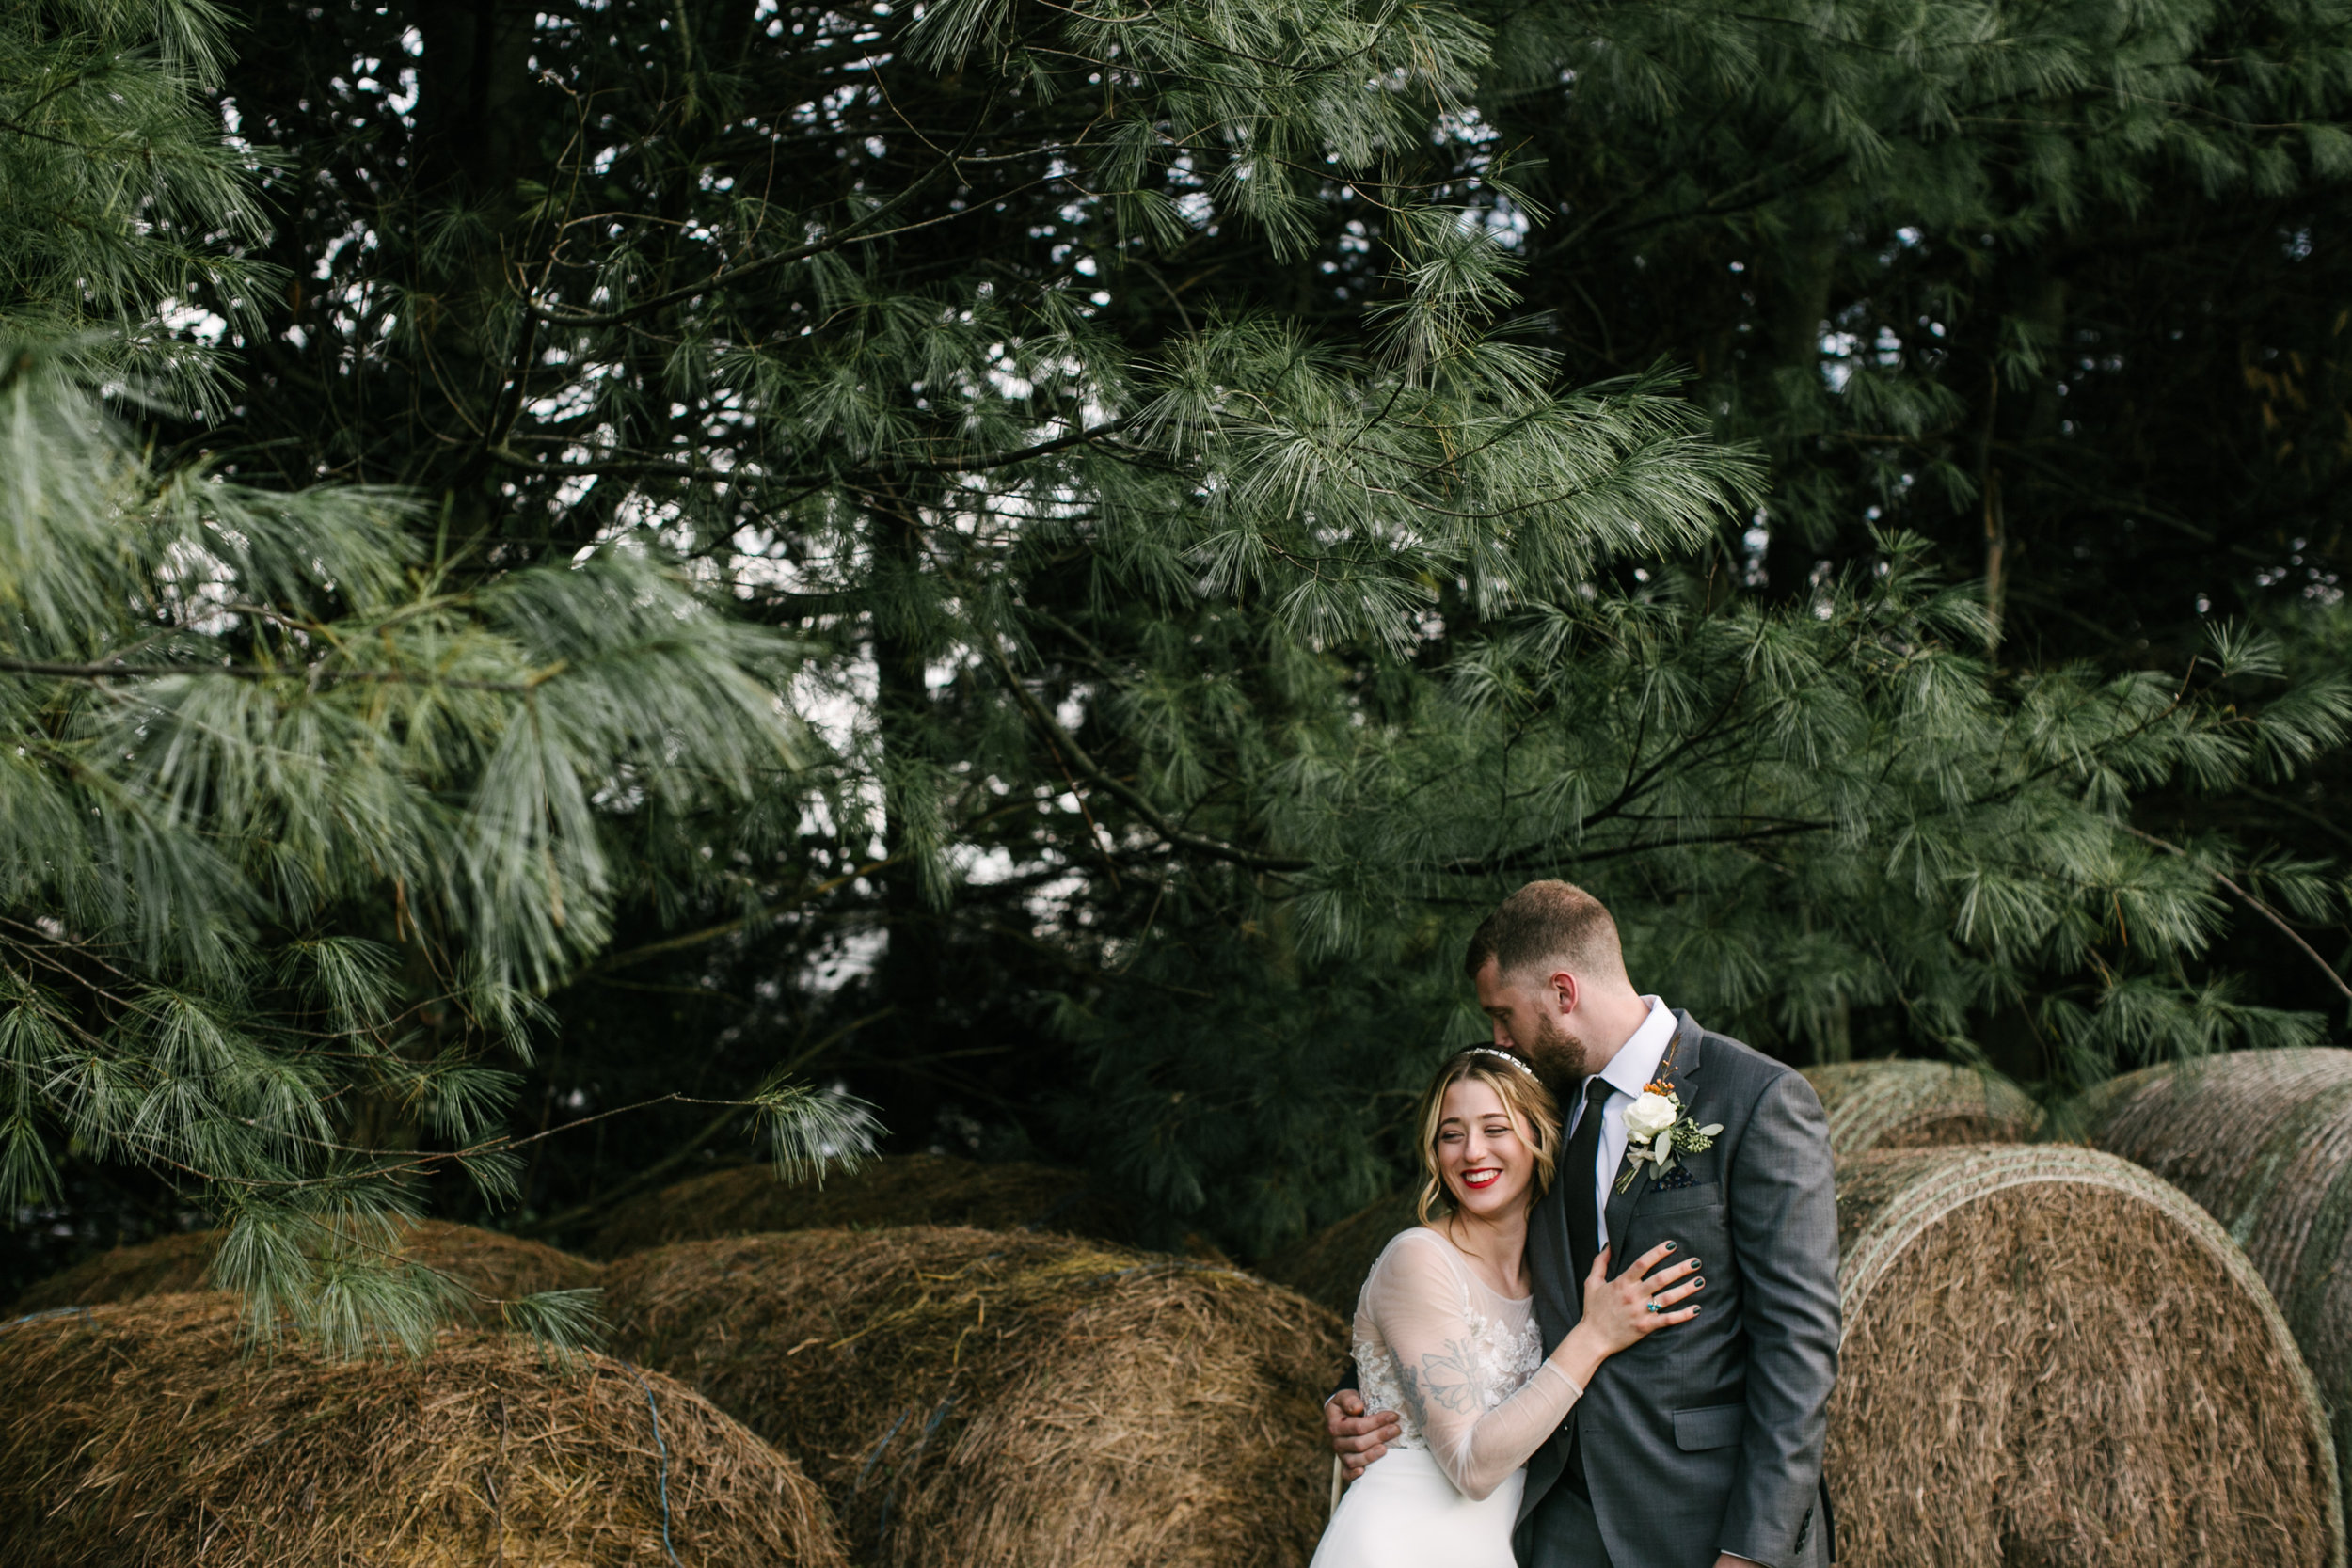 agpcollective_korn_coupleportraits-0984.jpg